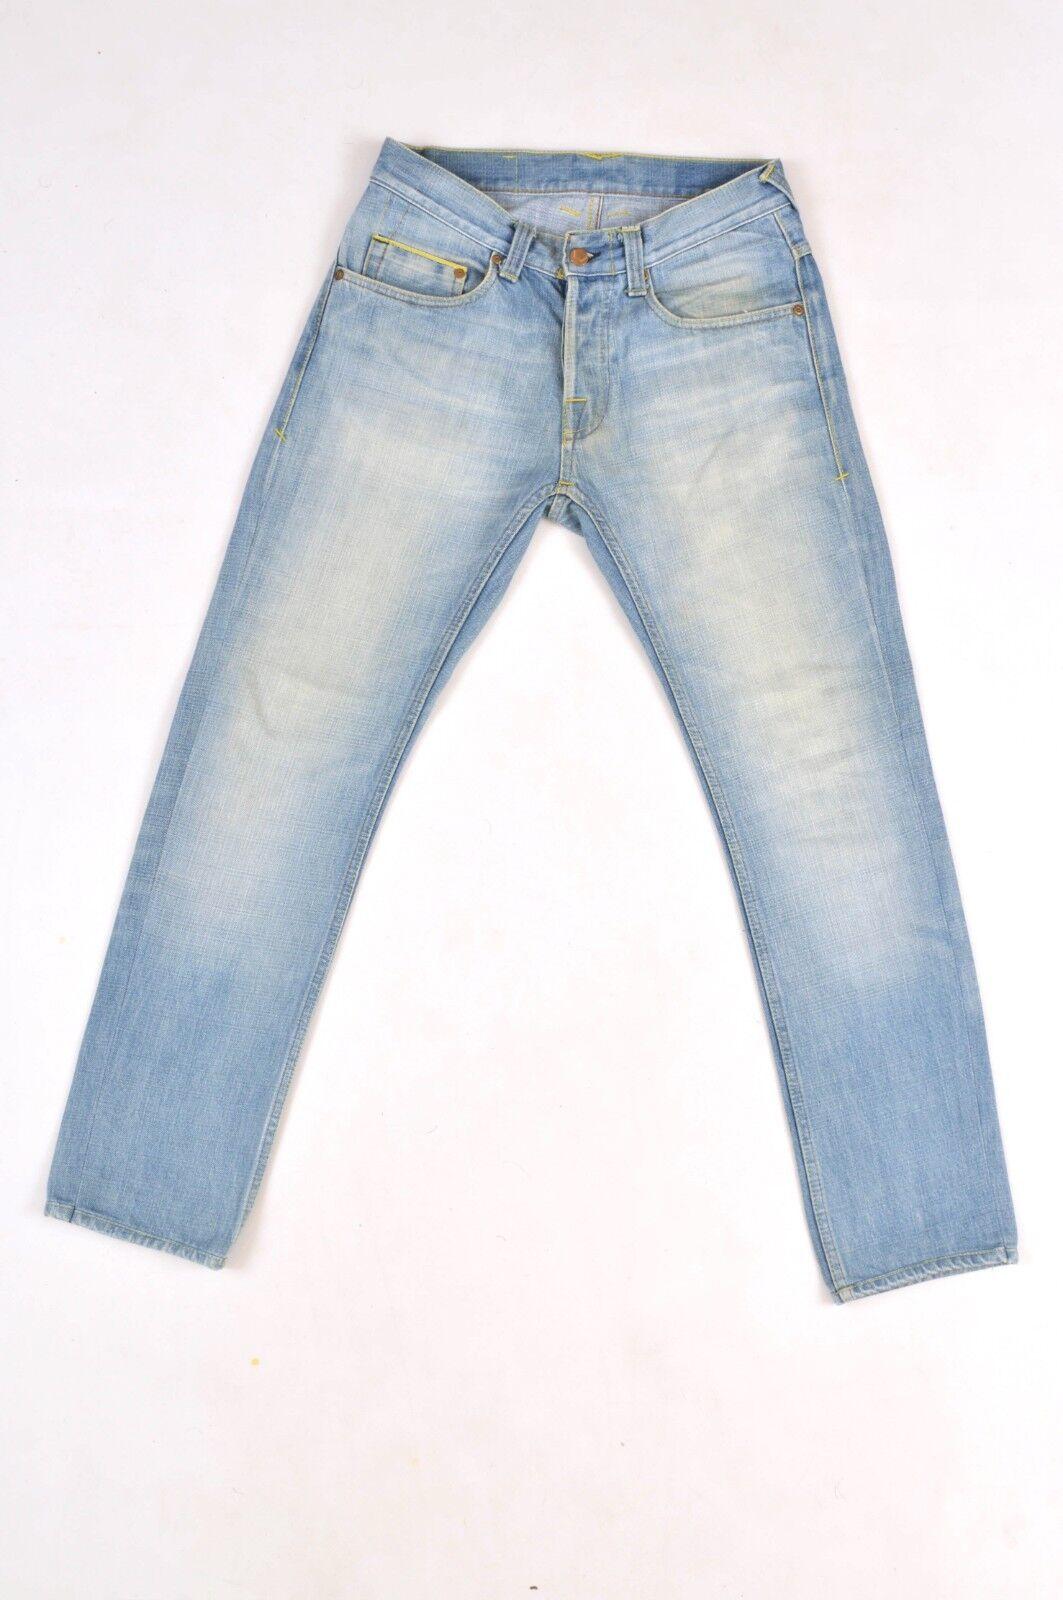 Care Label Designer Denim bluee Mens Jeans faded wash Straight SLIM W30 L29 VGC